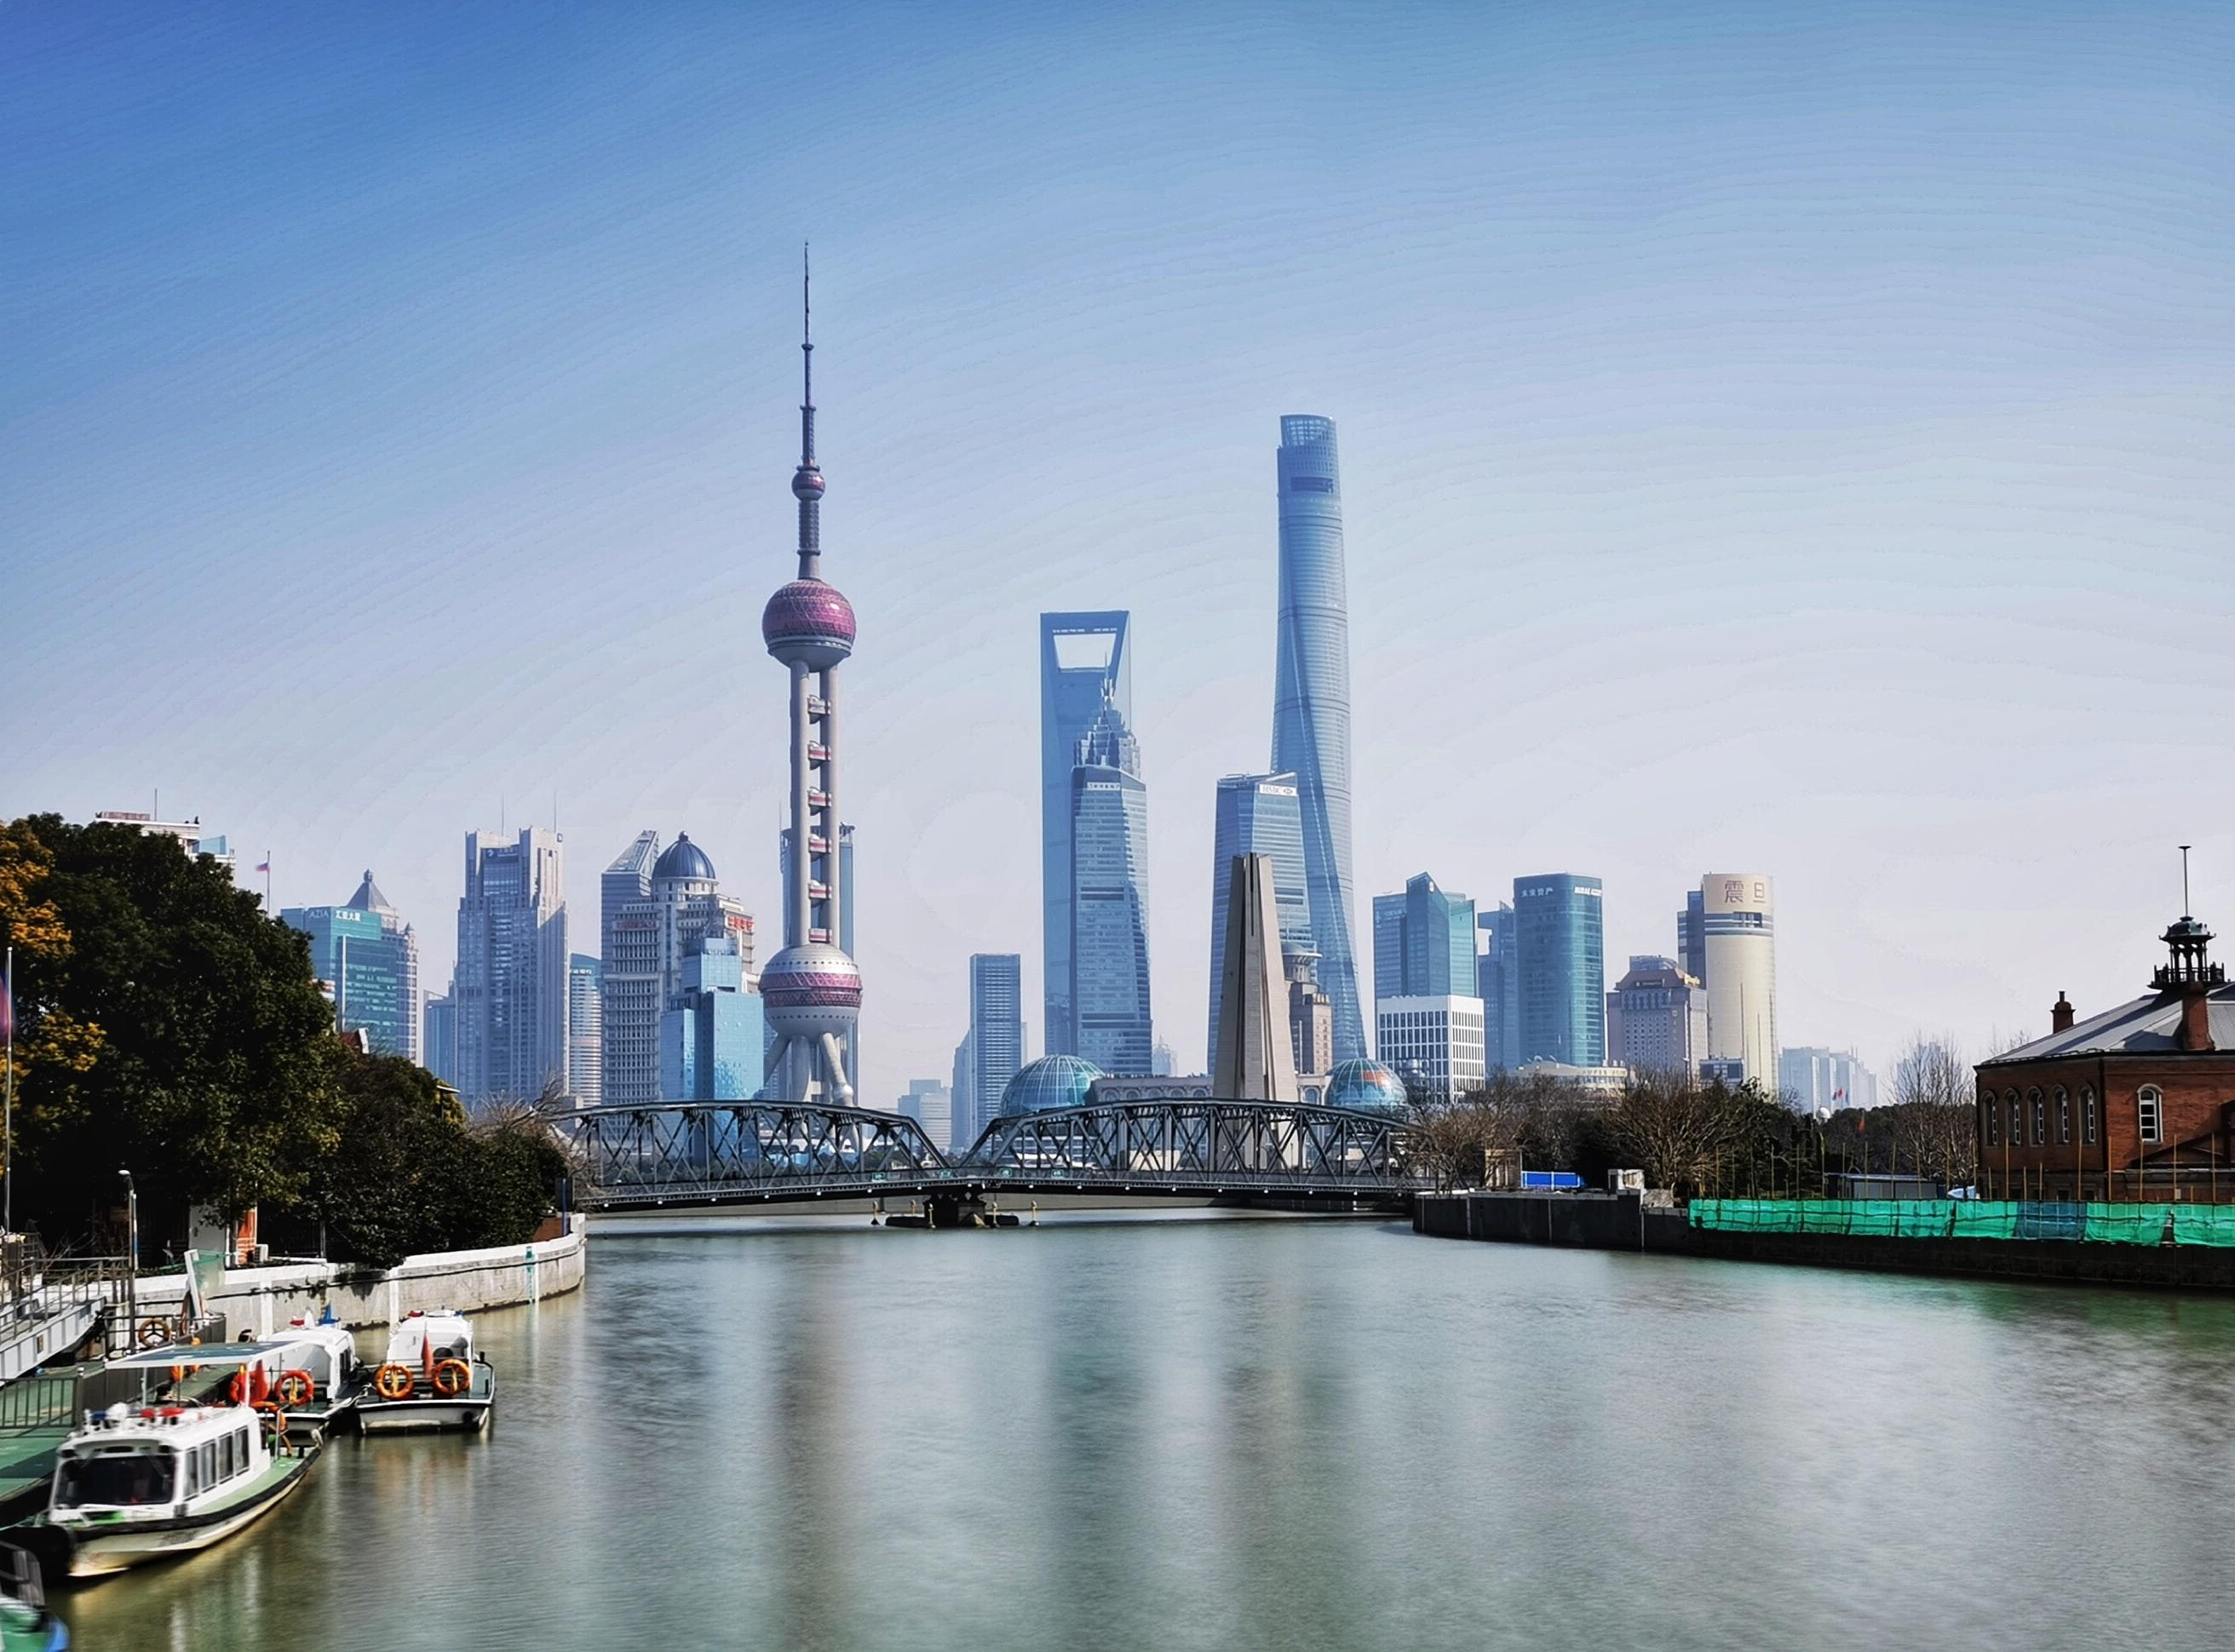 Torre Shanghai / Jorick Jing